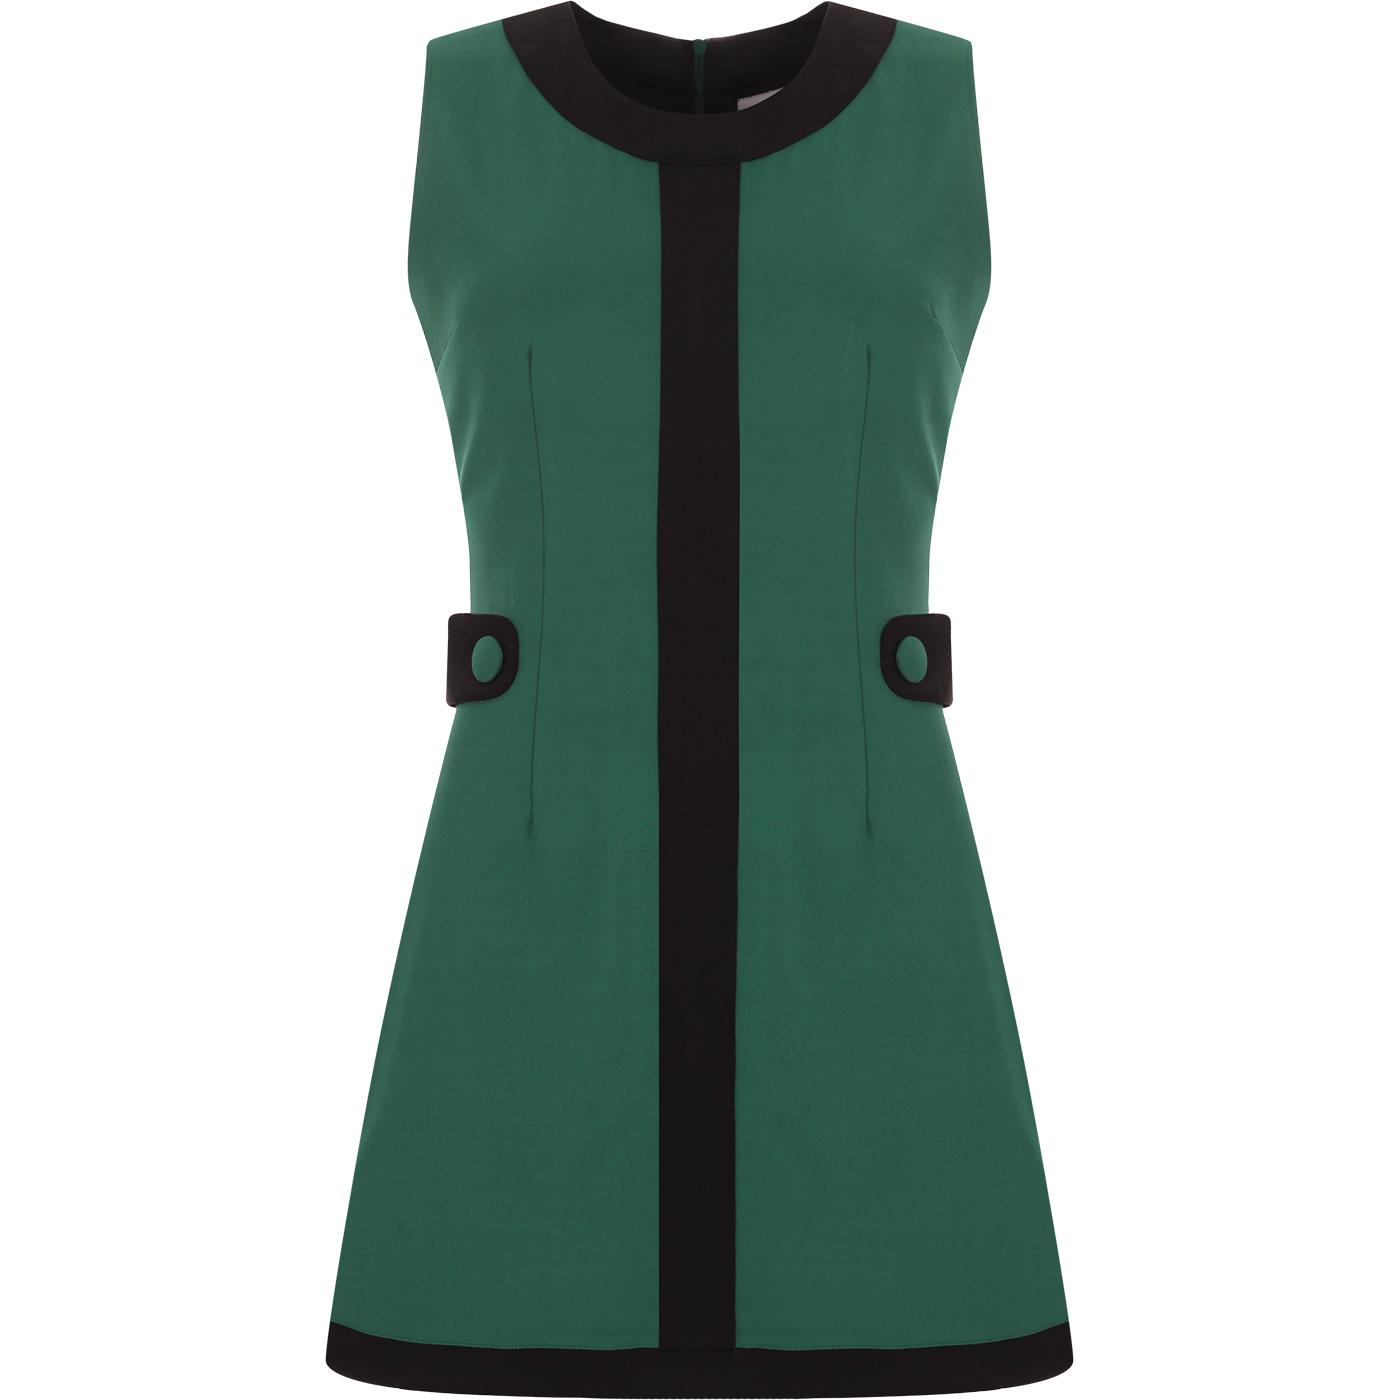 madcap england womens gogo 60s mod contrast side tabs mini dress teal green black